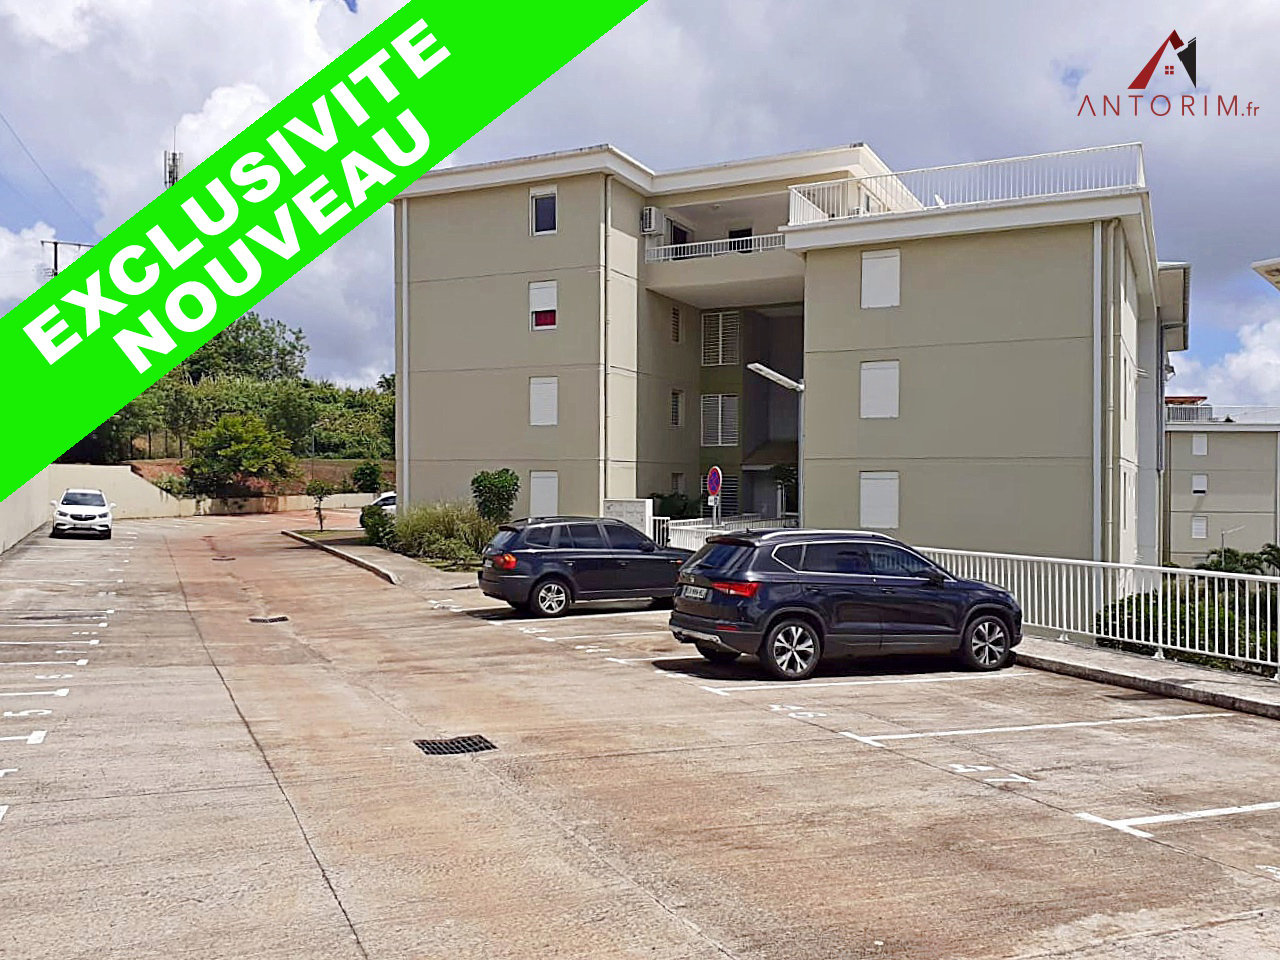 EXCLUSIVITE - SAINT-JOSEPH - Beau T3 - Terrasse - 2 Parkings